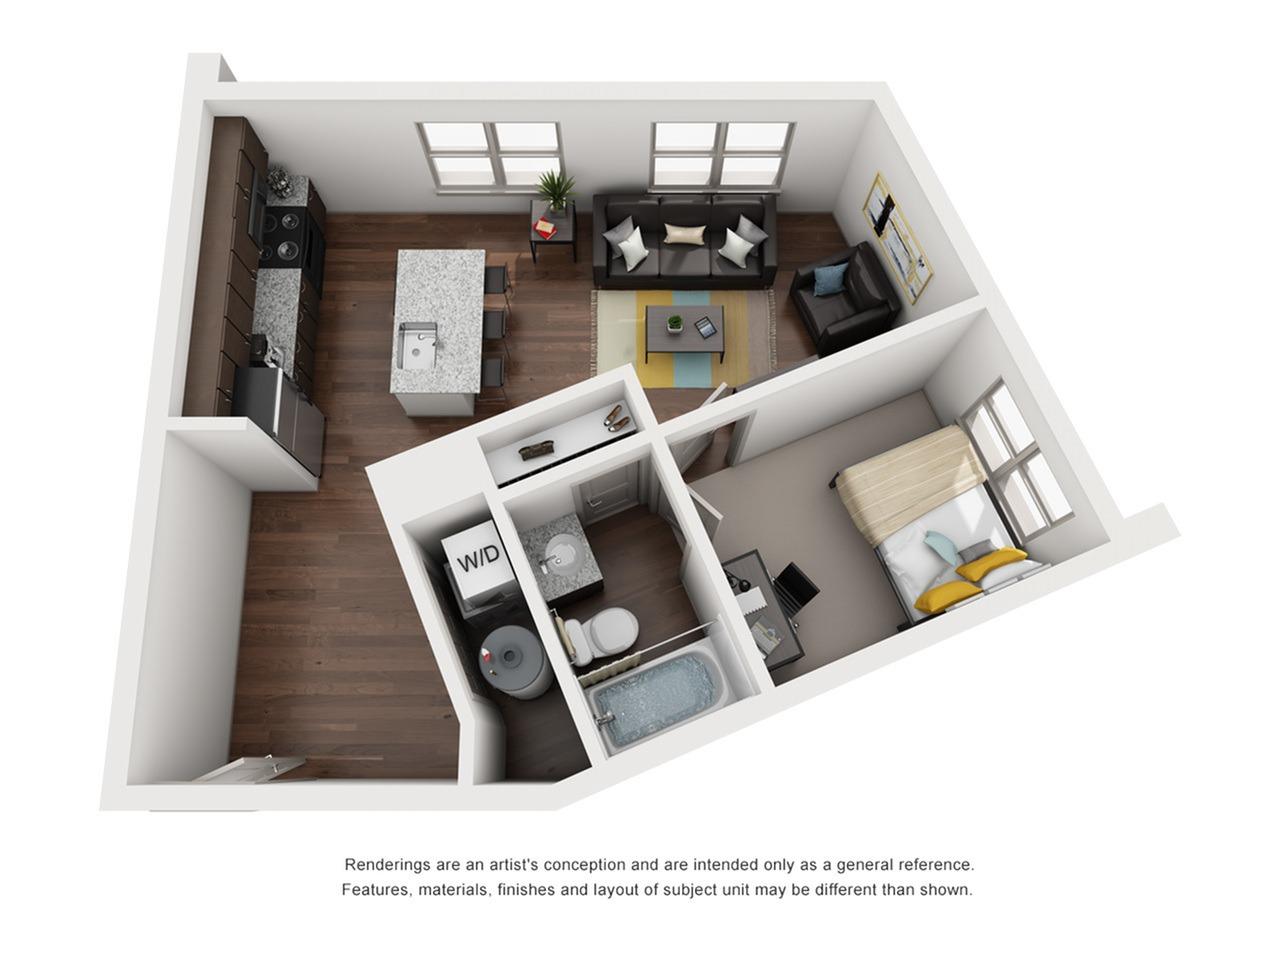 1 bedroom apartments near fsu